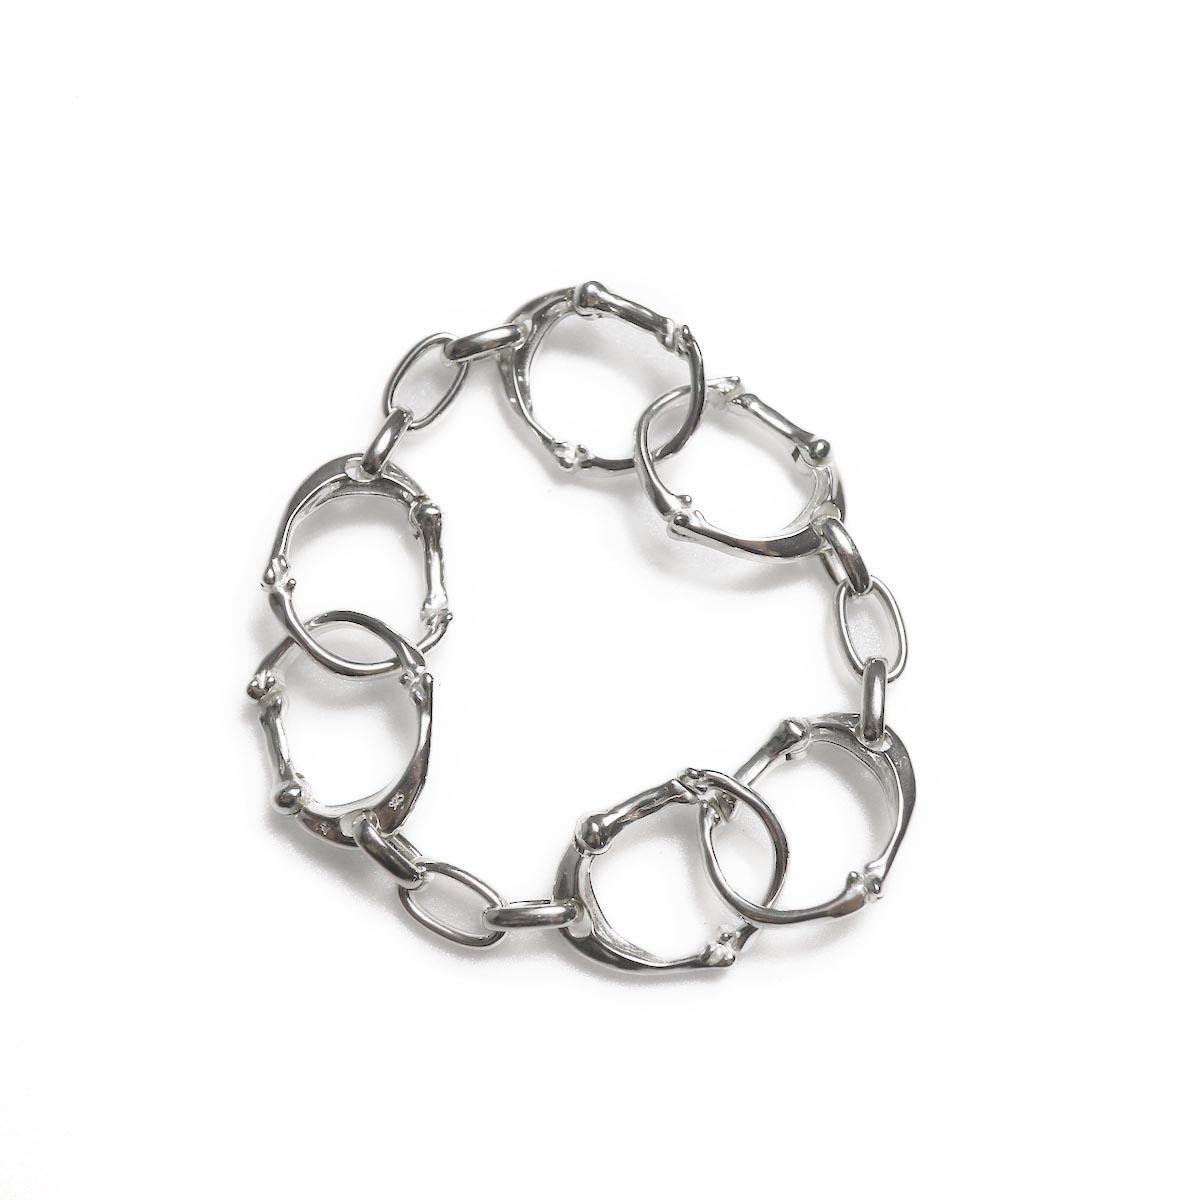 TheSoloist / sa.0054AW18 bone shaped carabiner bracelet.-S-